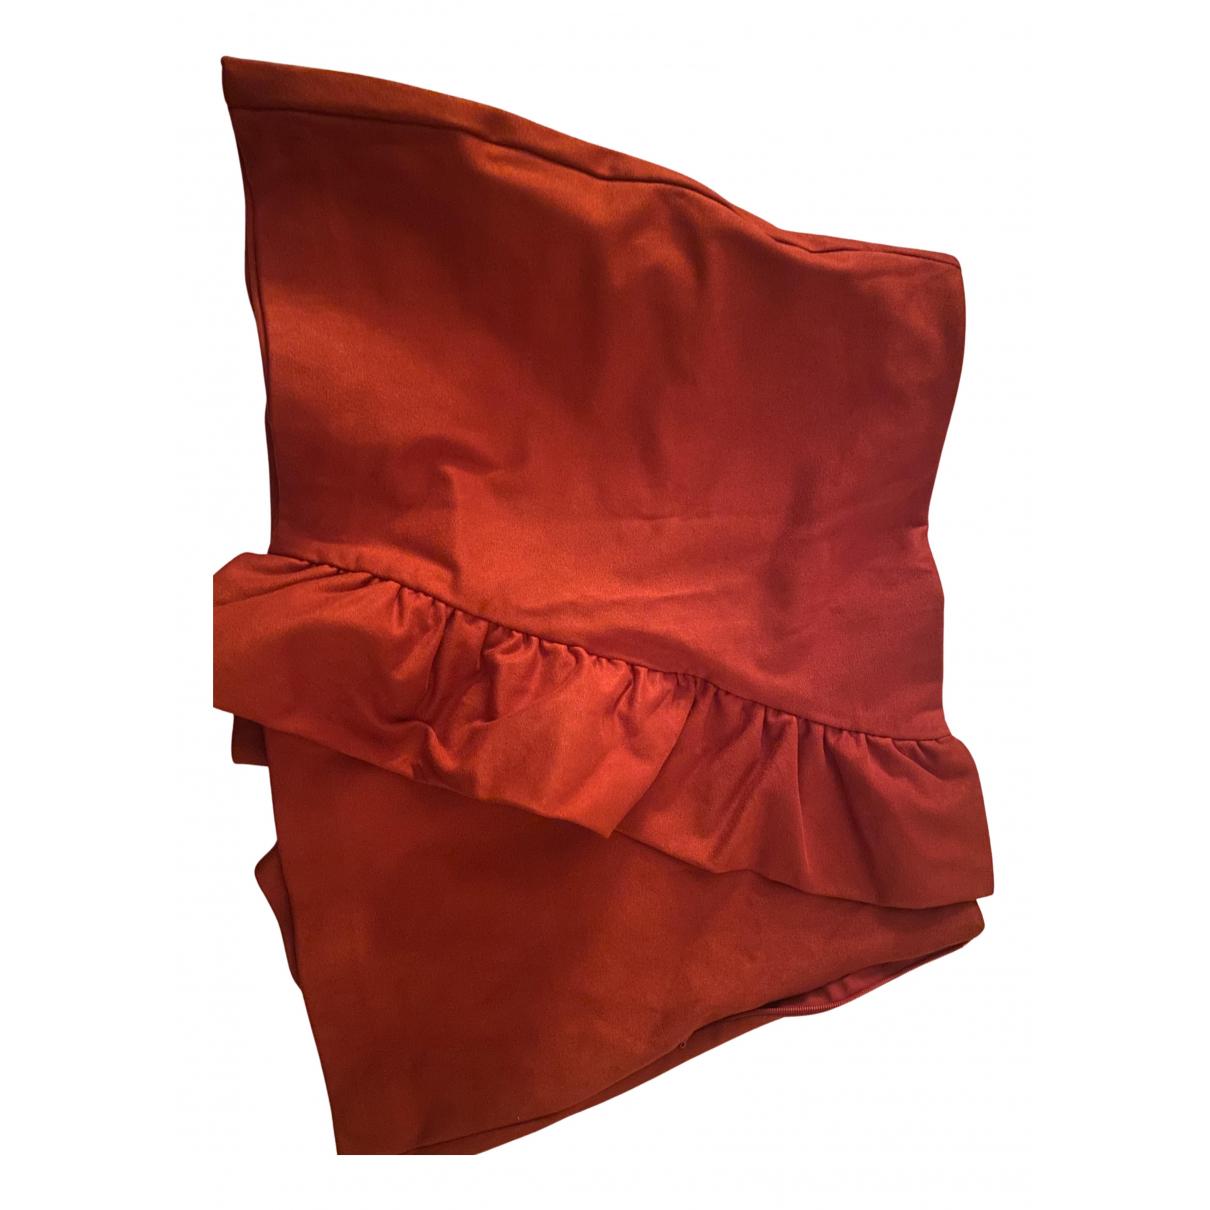 Zara \N Rocke in  Rot Baumwolle - Elasthan